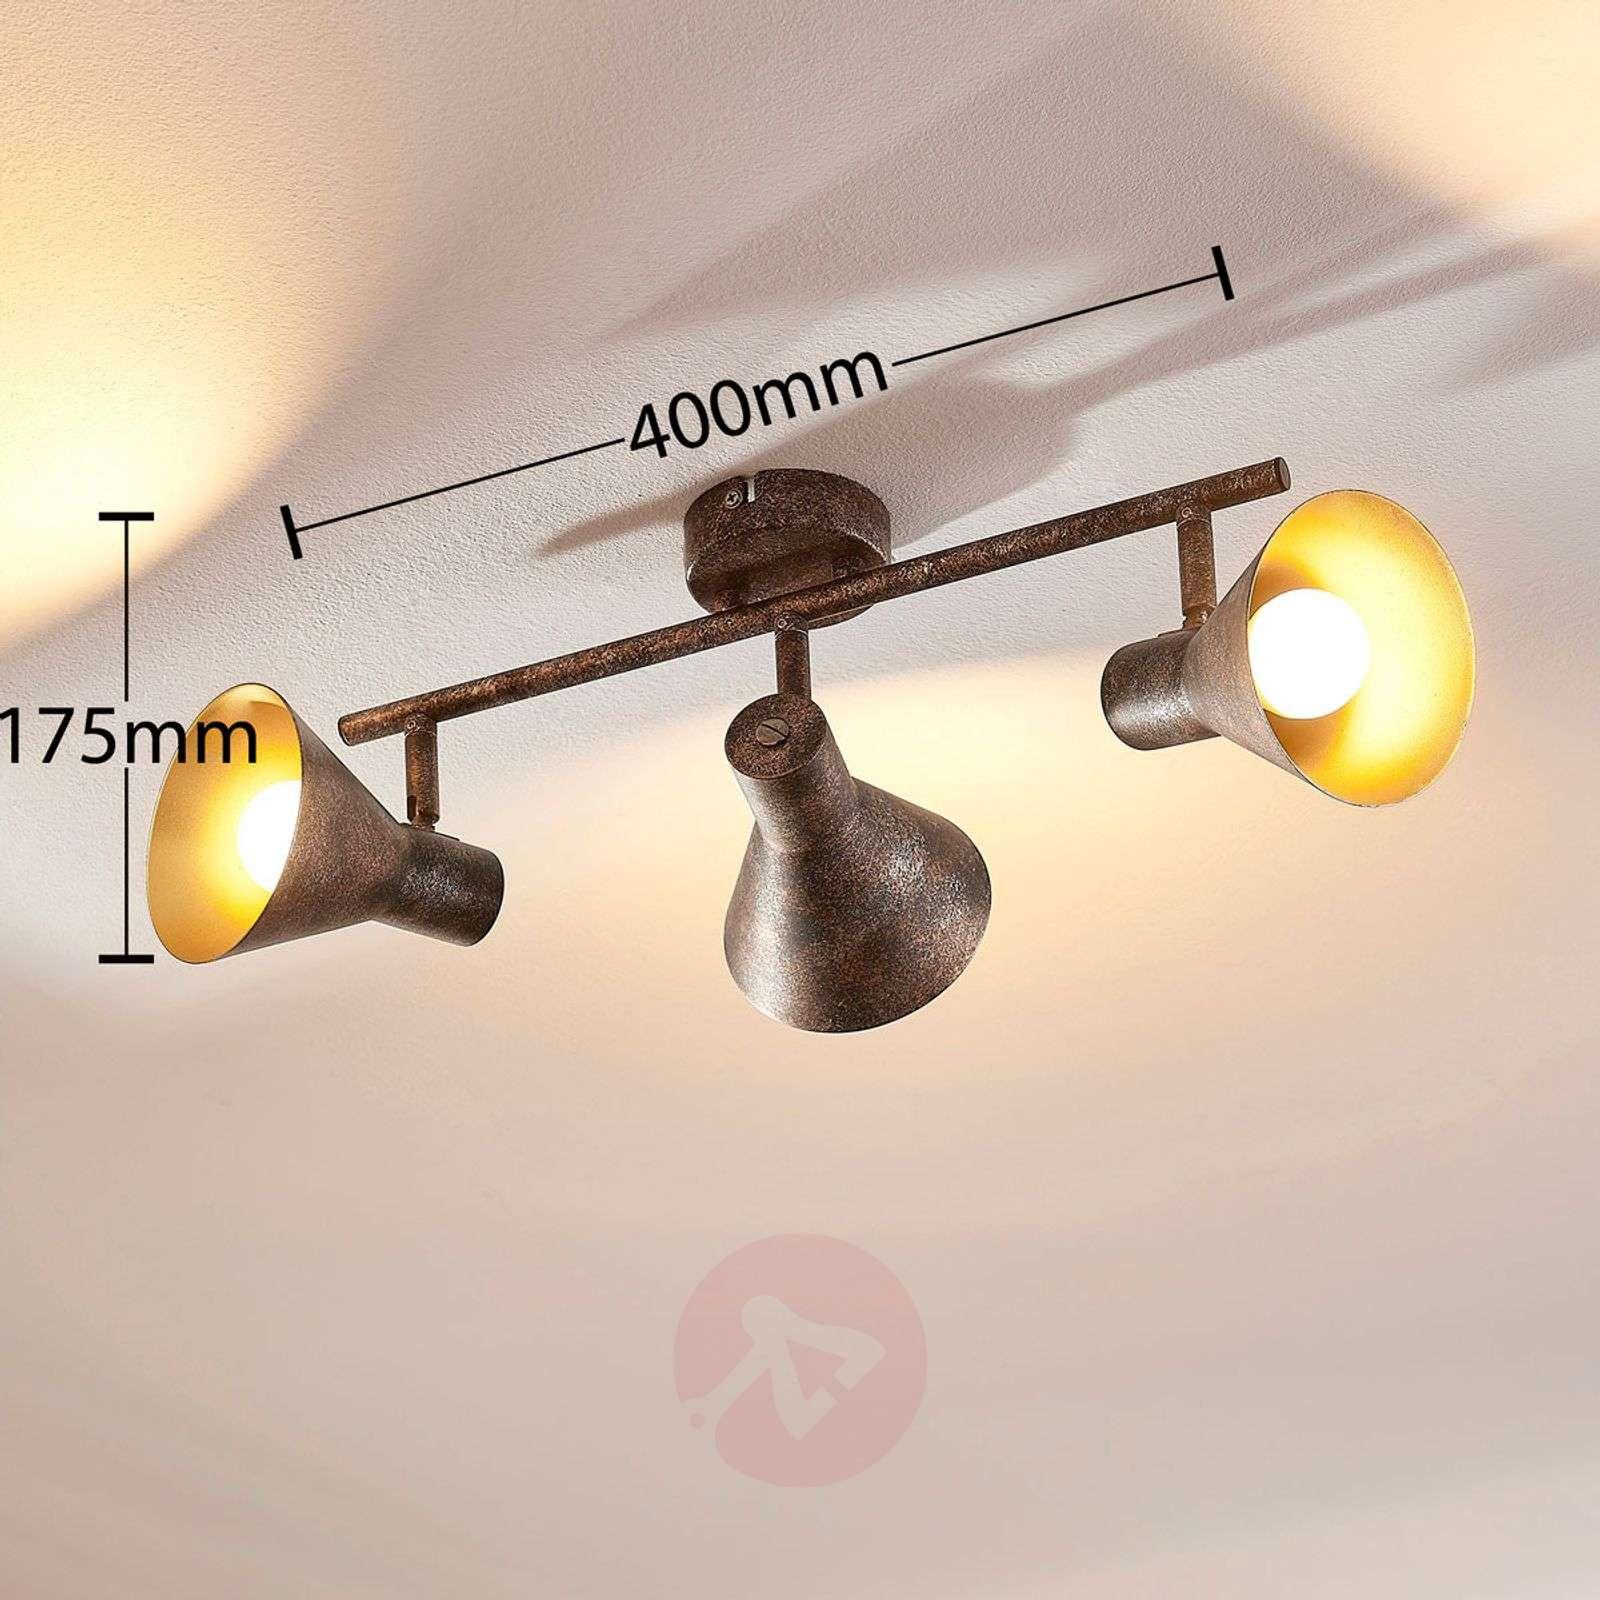 Zera pitkä LED-kattolamppu, easydim-9621541-02